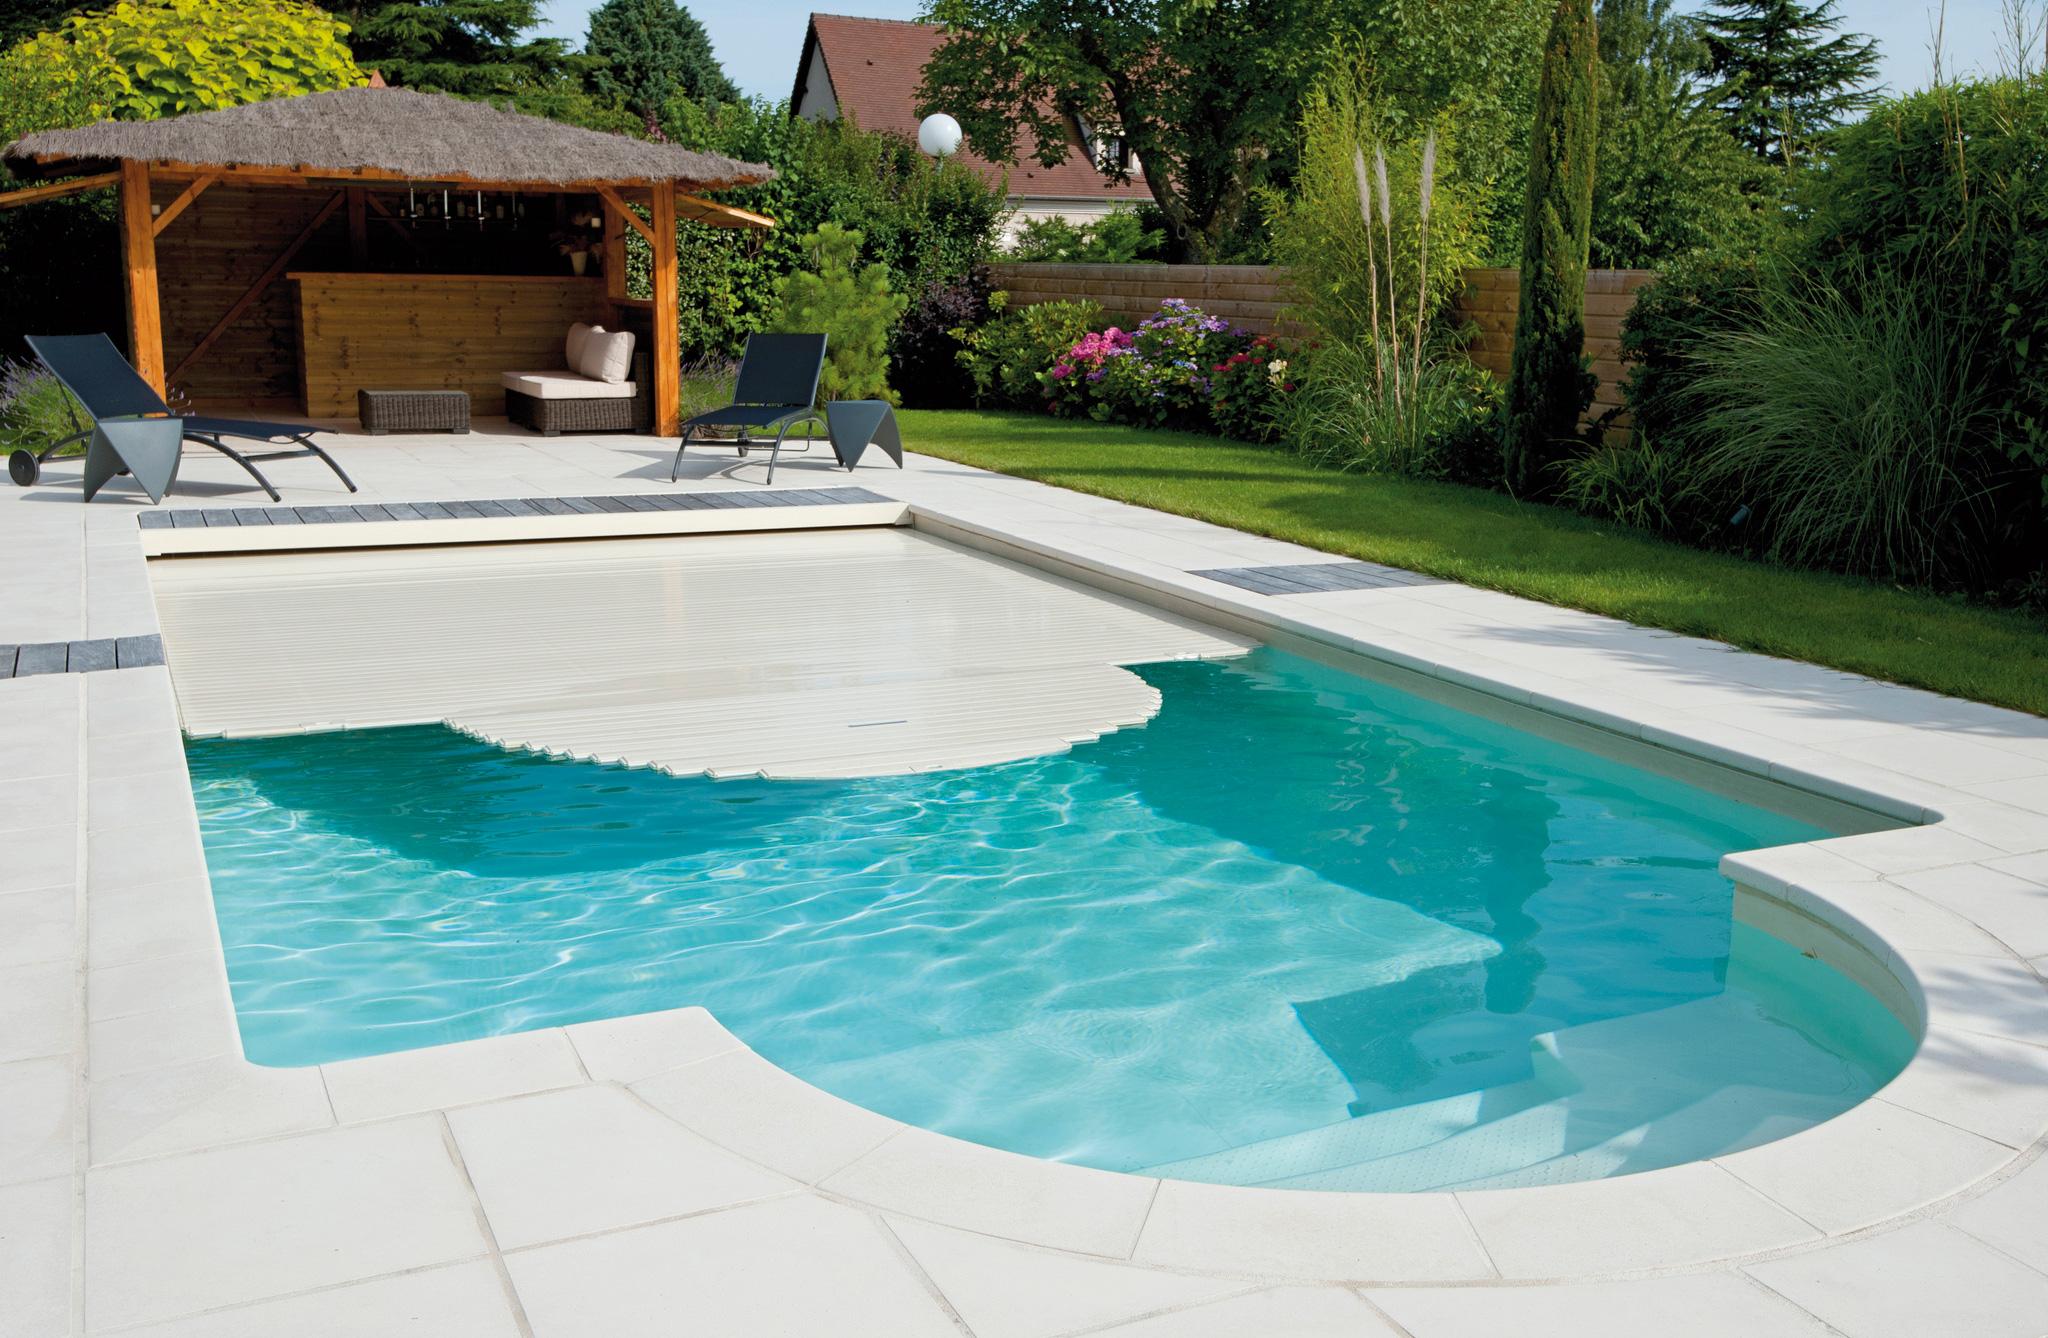 poolabdeckung desjoyaux pools. Black Bedroom Furniture Sets. Home Design Ideas